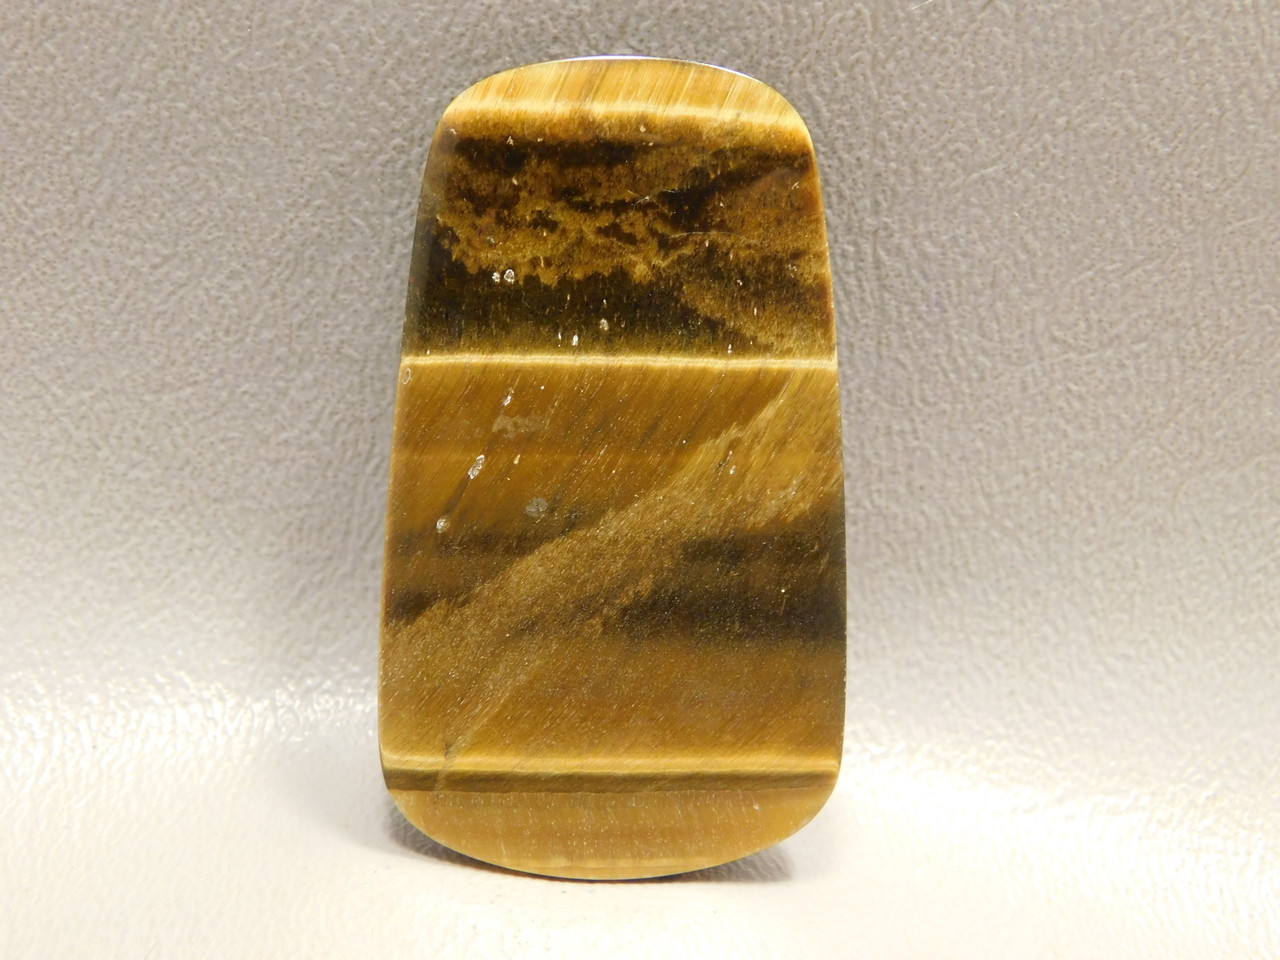 Golden Tigereye Tiger's Eye Chatoyant Stone Cabochon #20